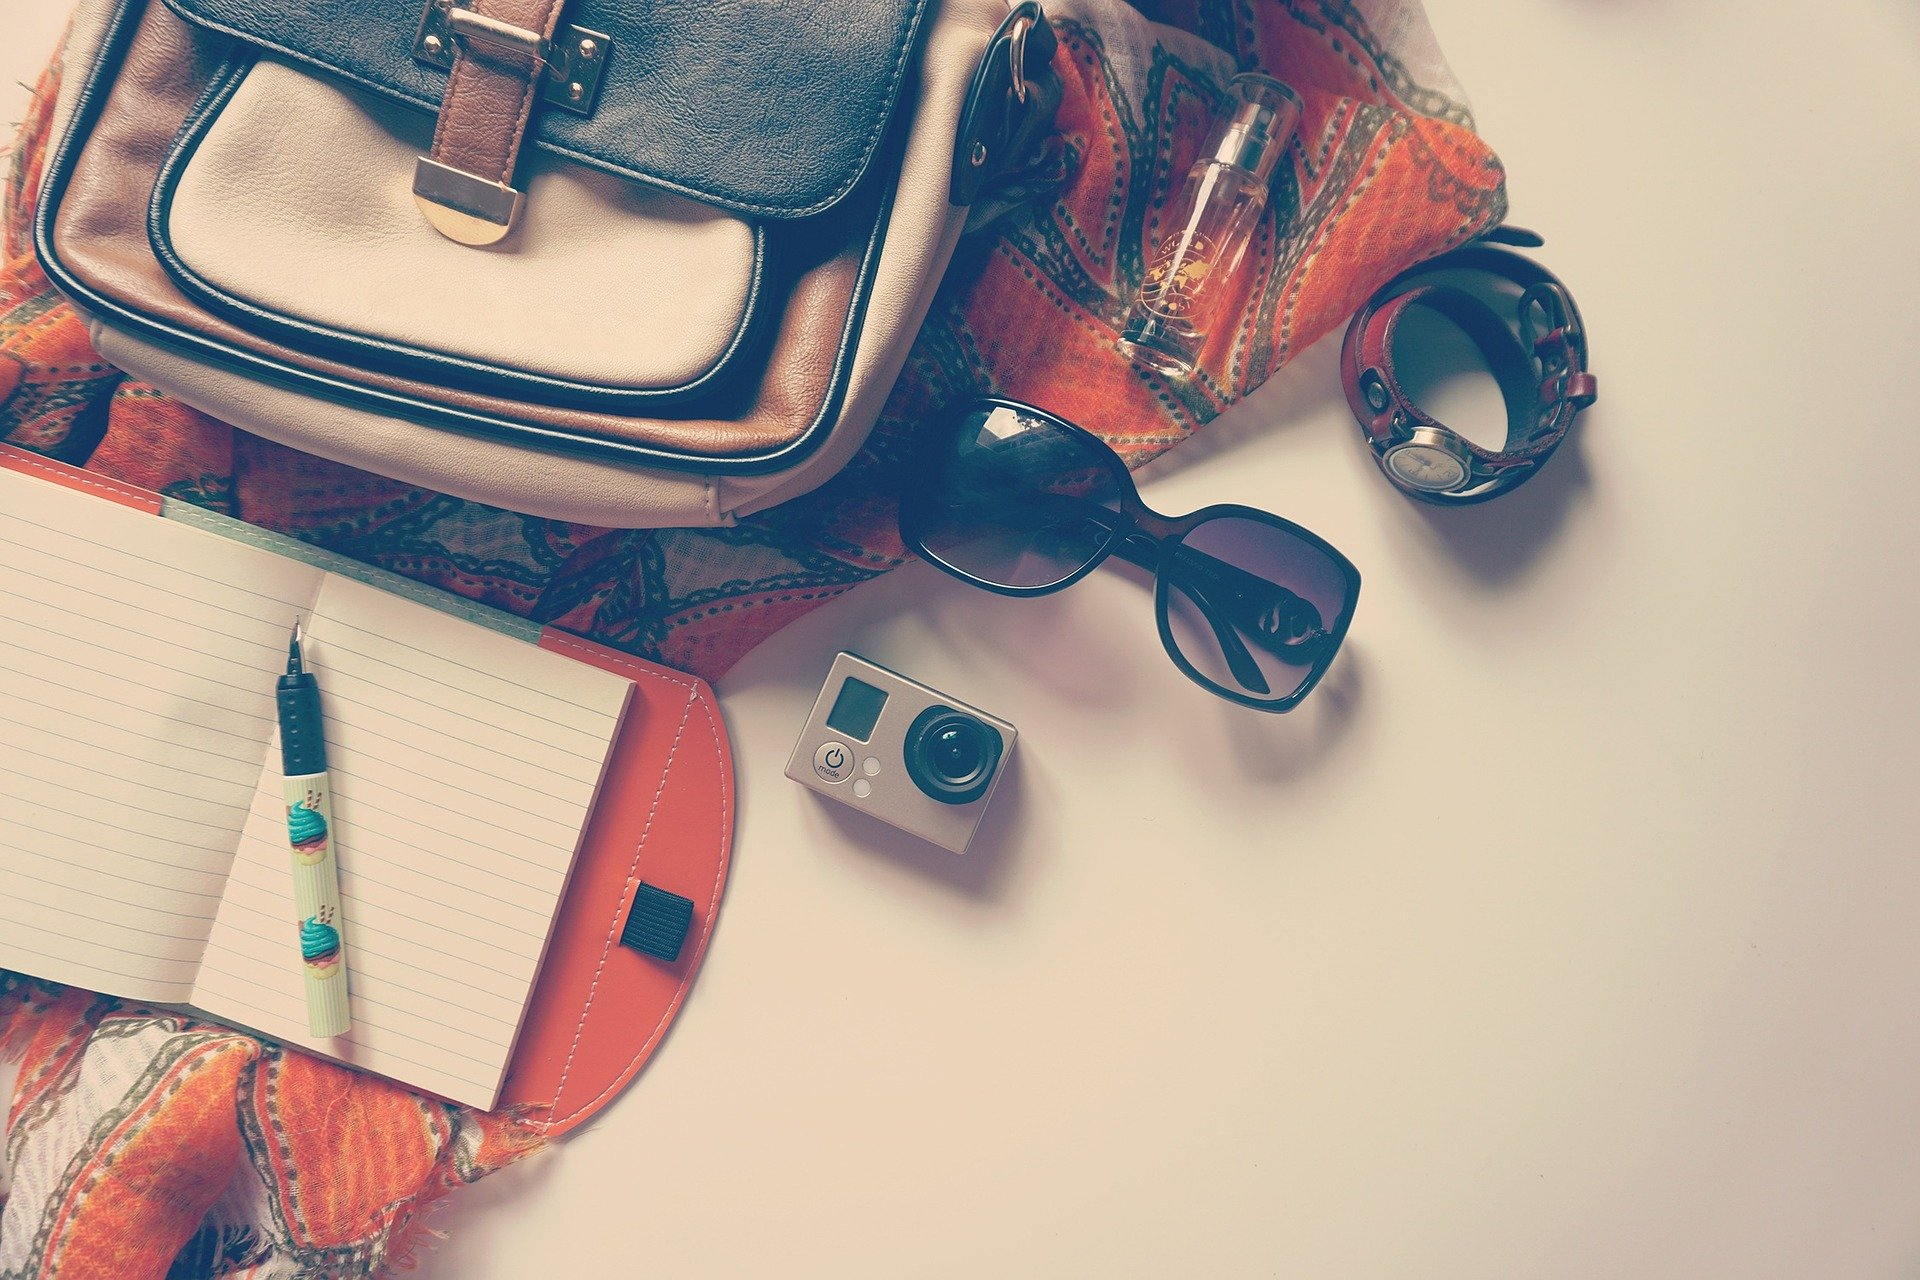 agenda ochelari pix aparat de fotografie si rucsac pentru calatorii